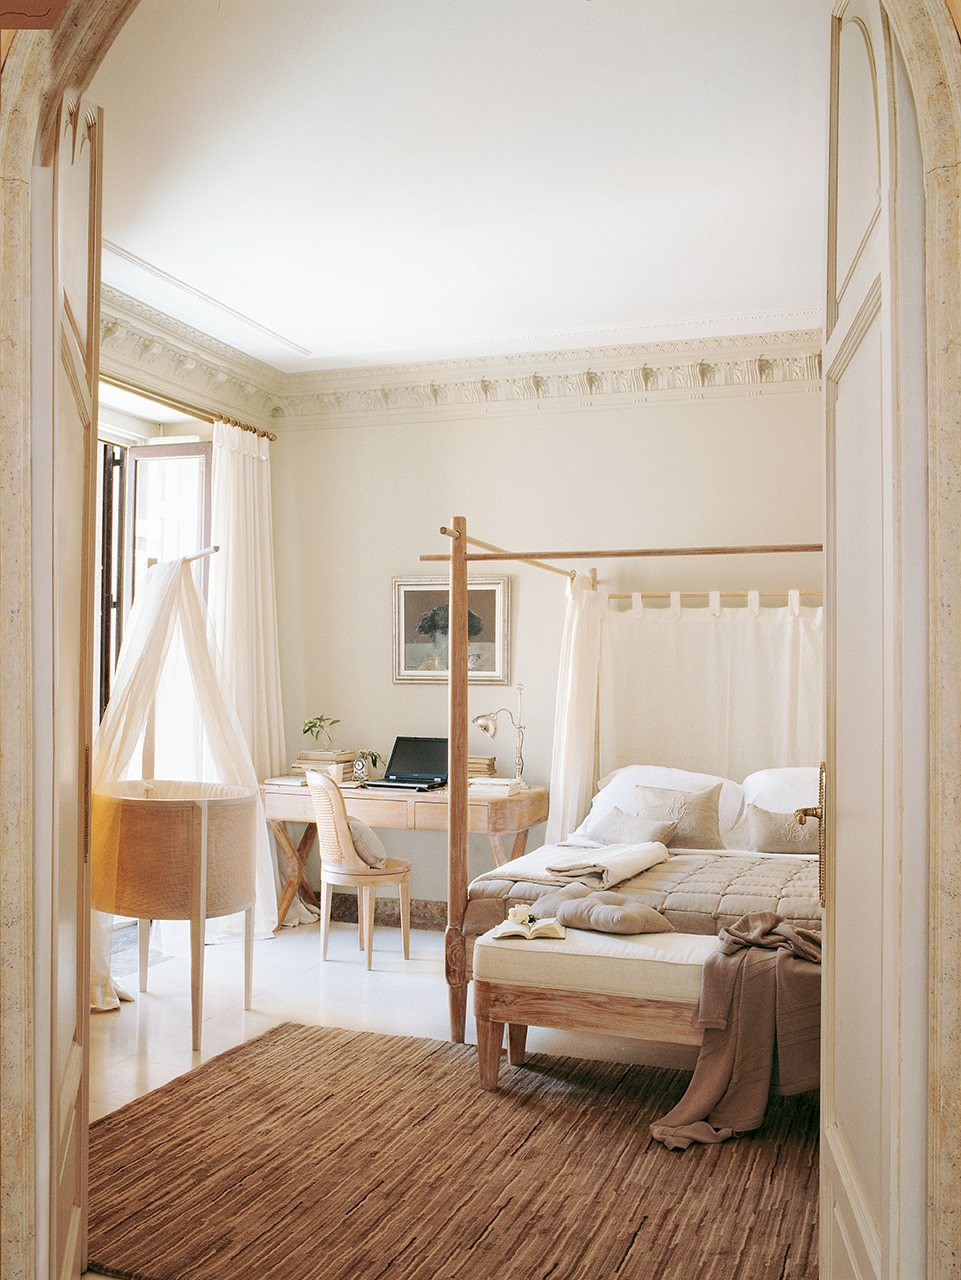 21 Charming & Comfortable Bedroom Interior Design on Comfortable Bedroom Ideas  id=52031